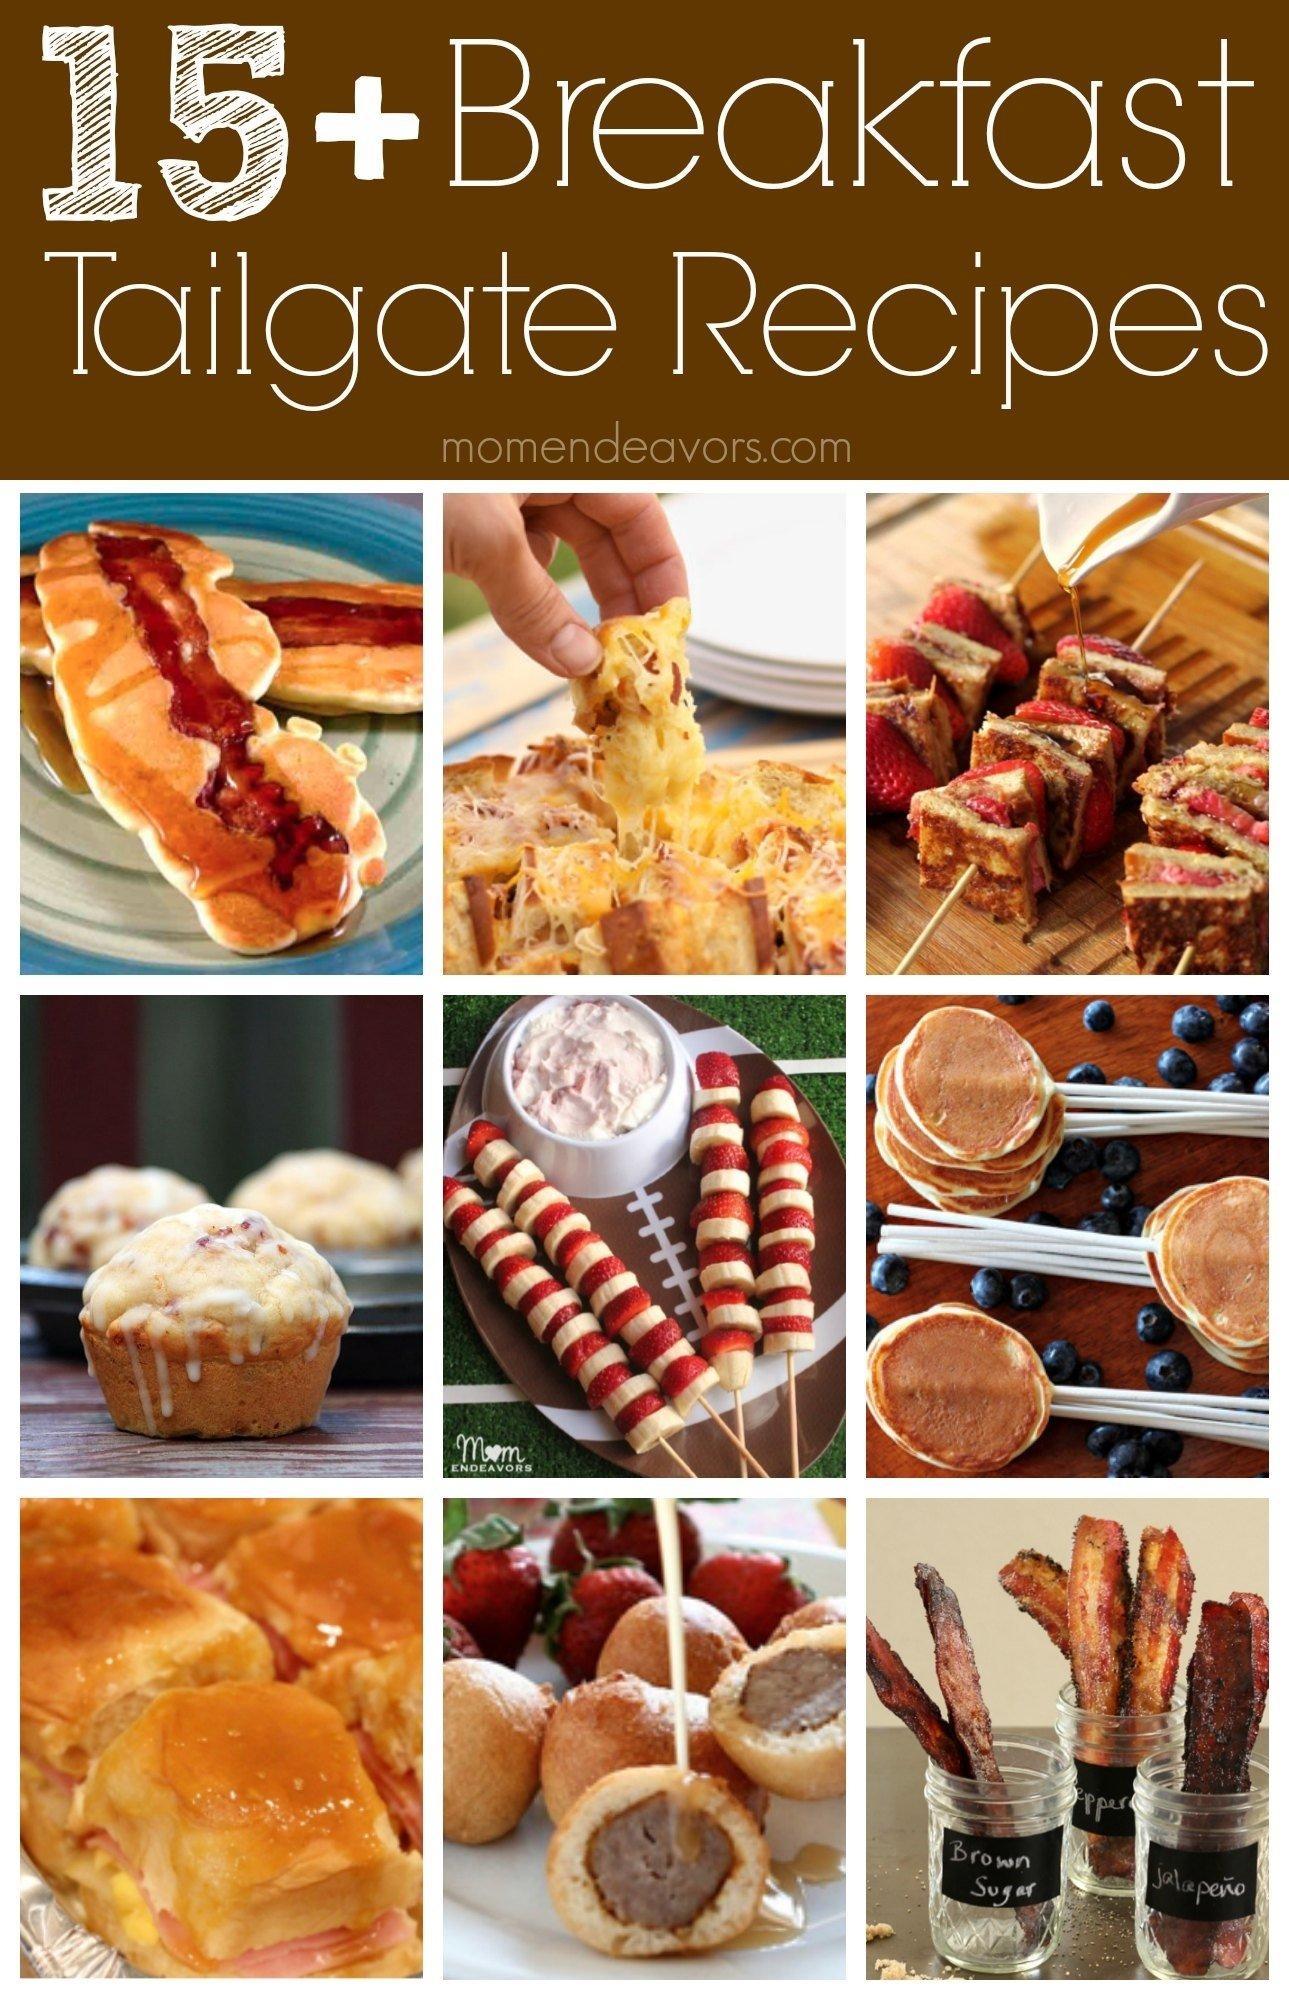 10 Best Football Party Food Menu Ideas fun breakfast tailgate recipe ideas college football tailgate party 1 2020